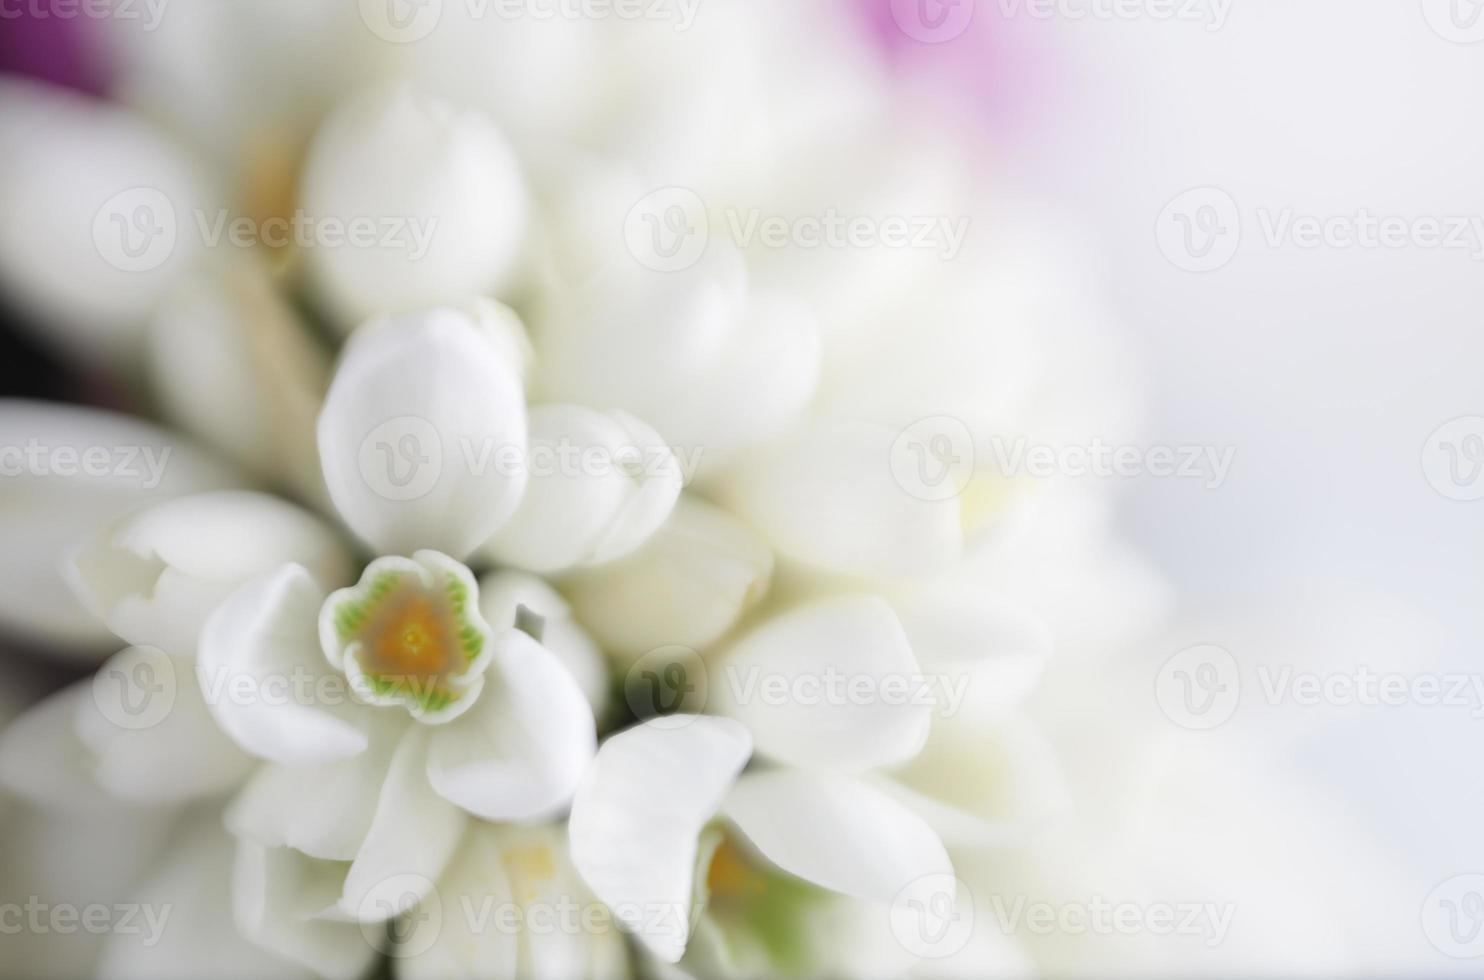 Soft Focus Sea ... bloem achtergrond met kopie ruimte. foto